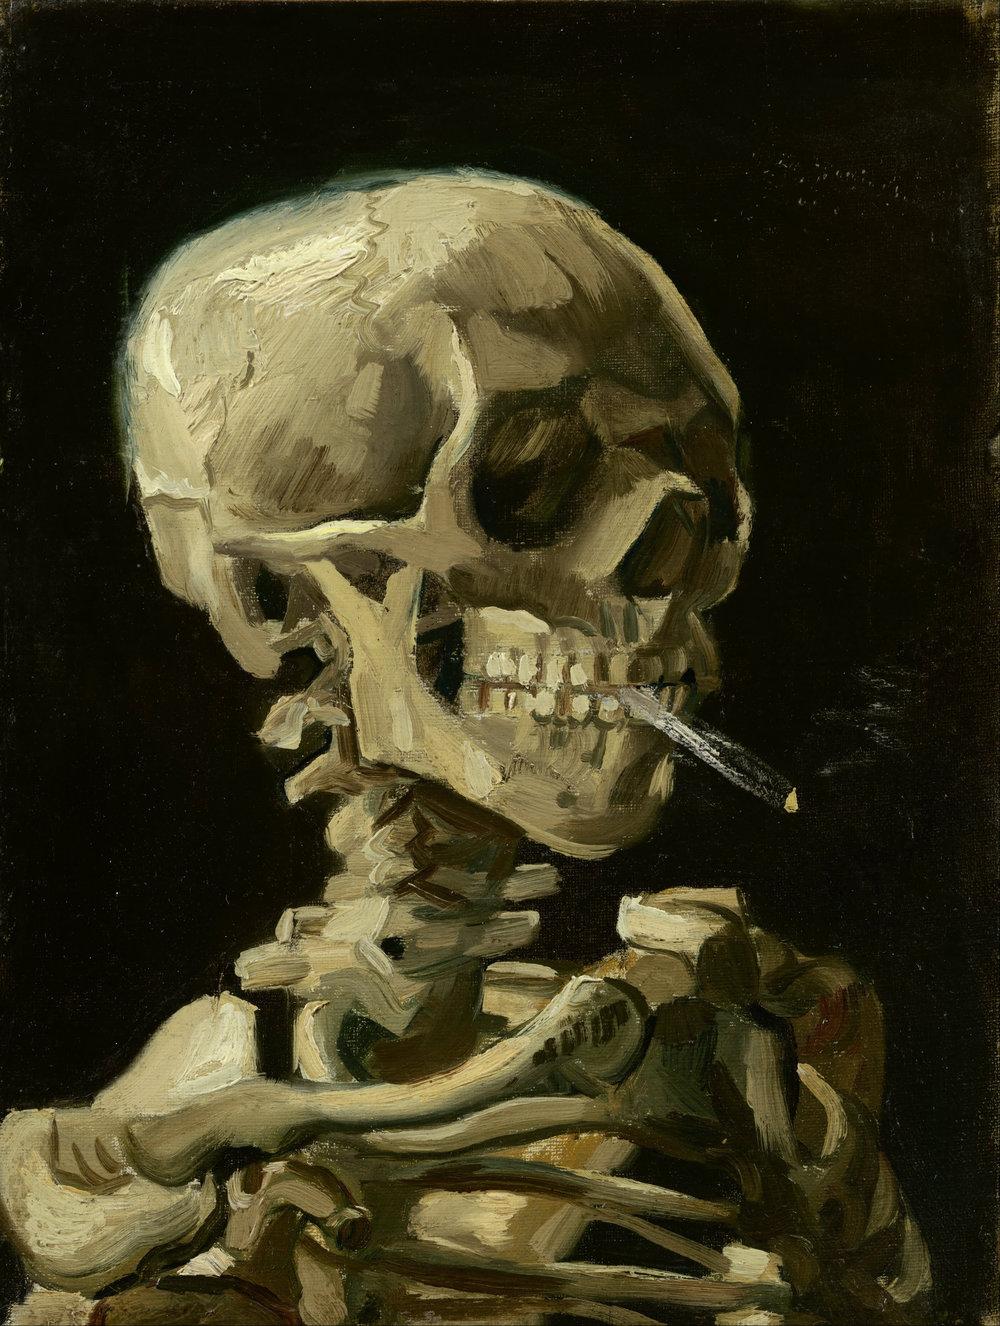 Cabeza de un esqueleto con cigarrillo encendido, de Vincent Van Gogh, 1886